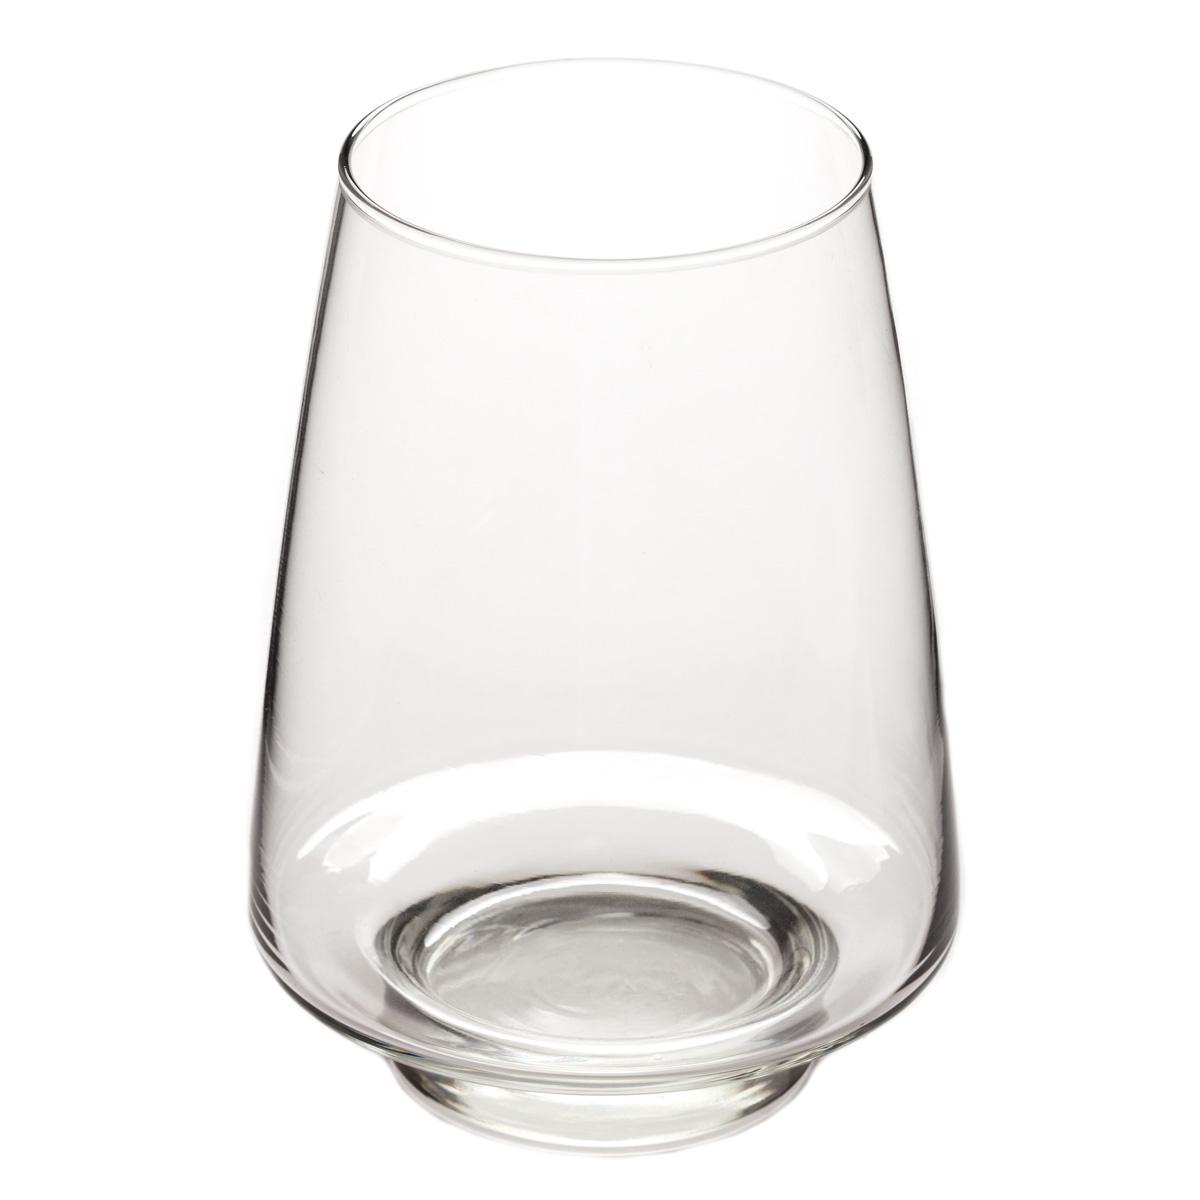 Libbey glass pyramid vase